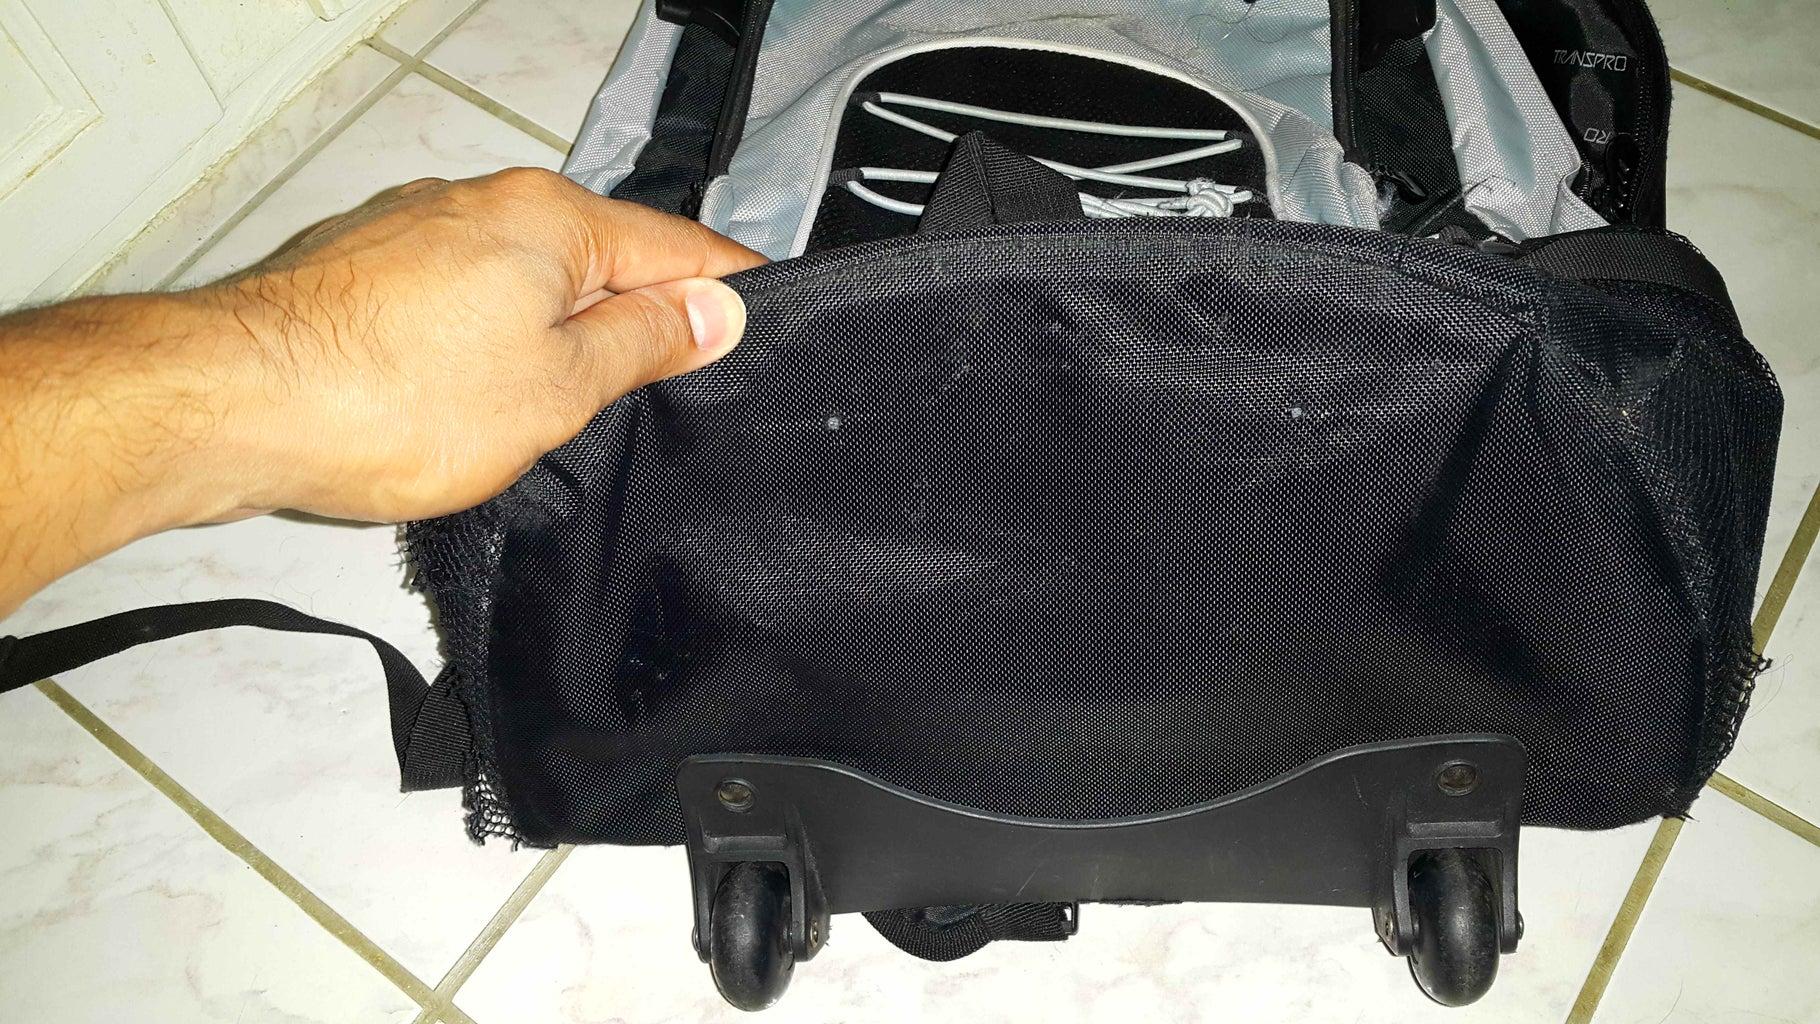 Fixing a Travel Bag.